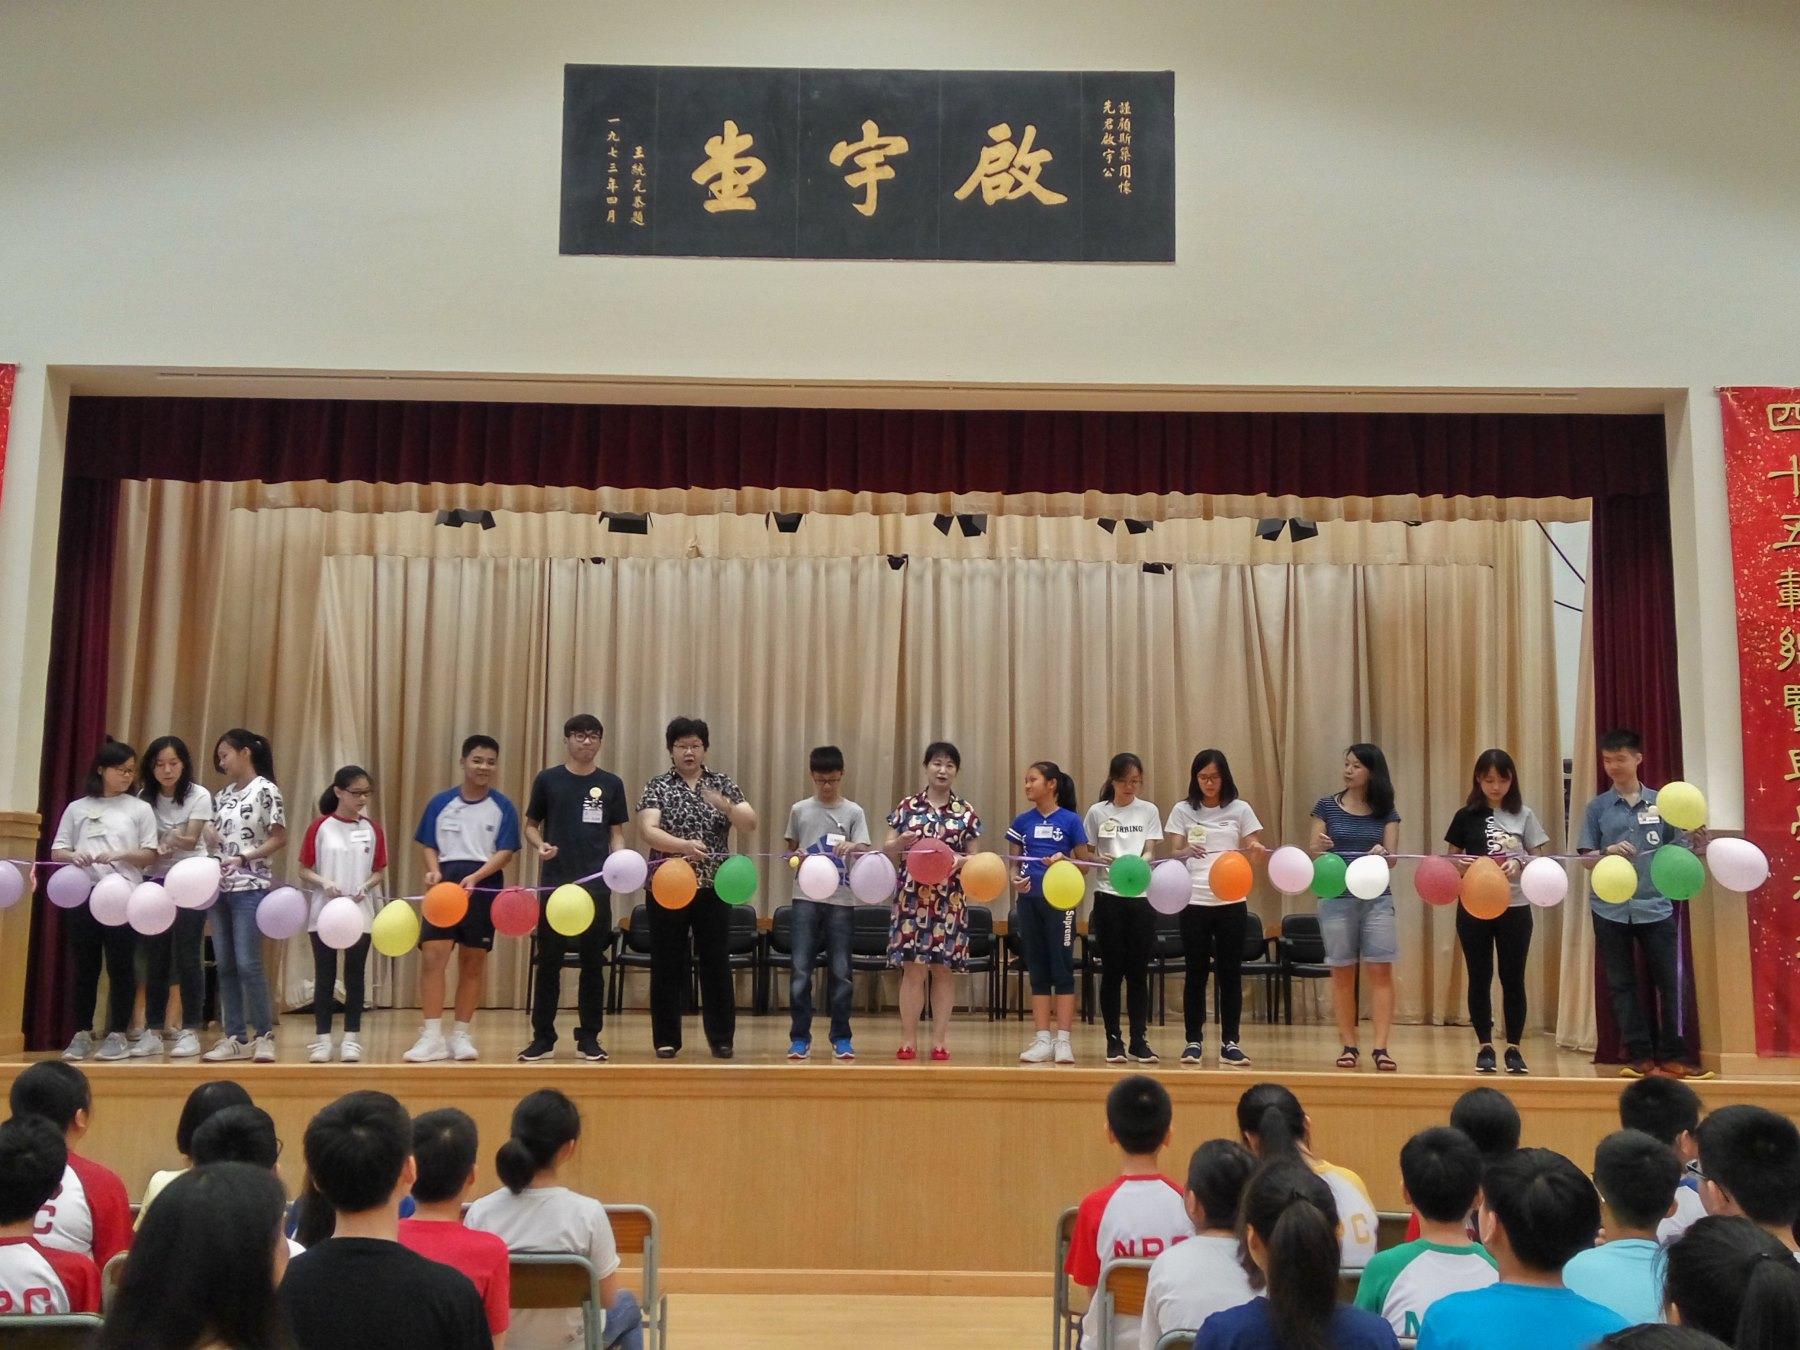 http://www.npc.edu.hk/sites/default/files/img_20170814_090751_hdr.jpg